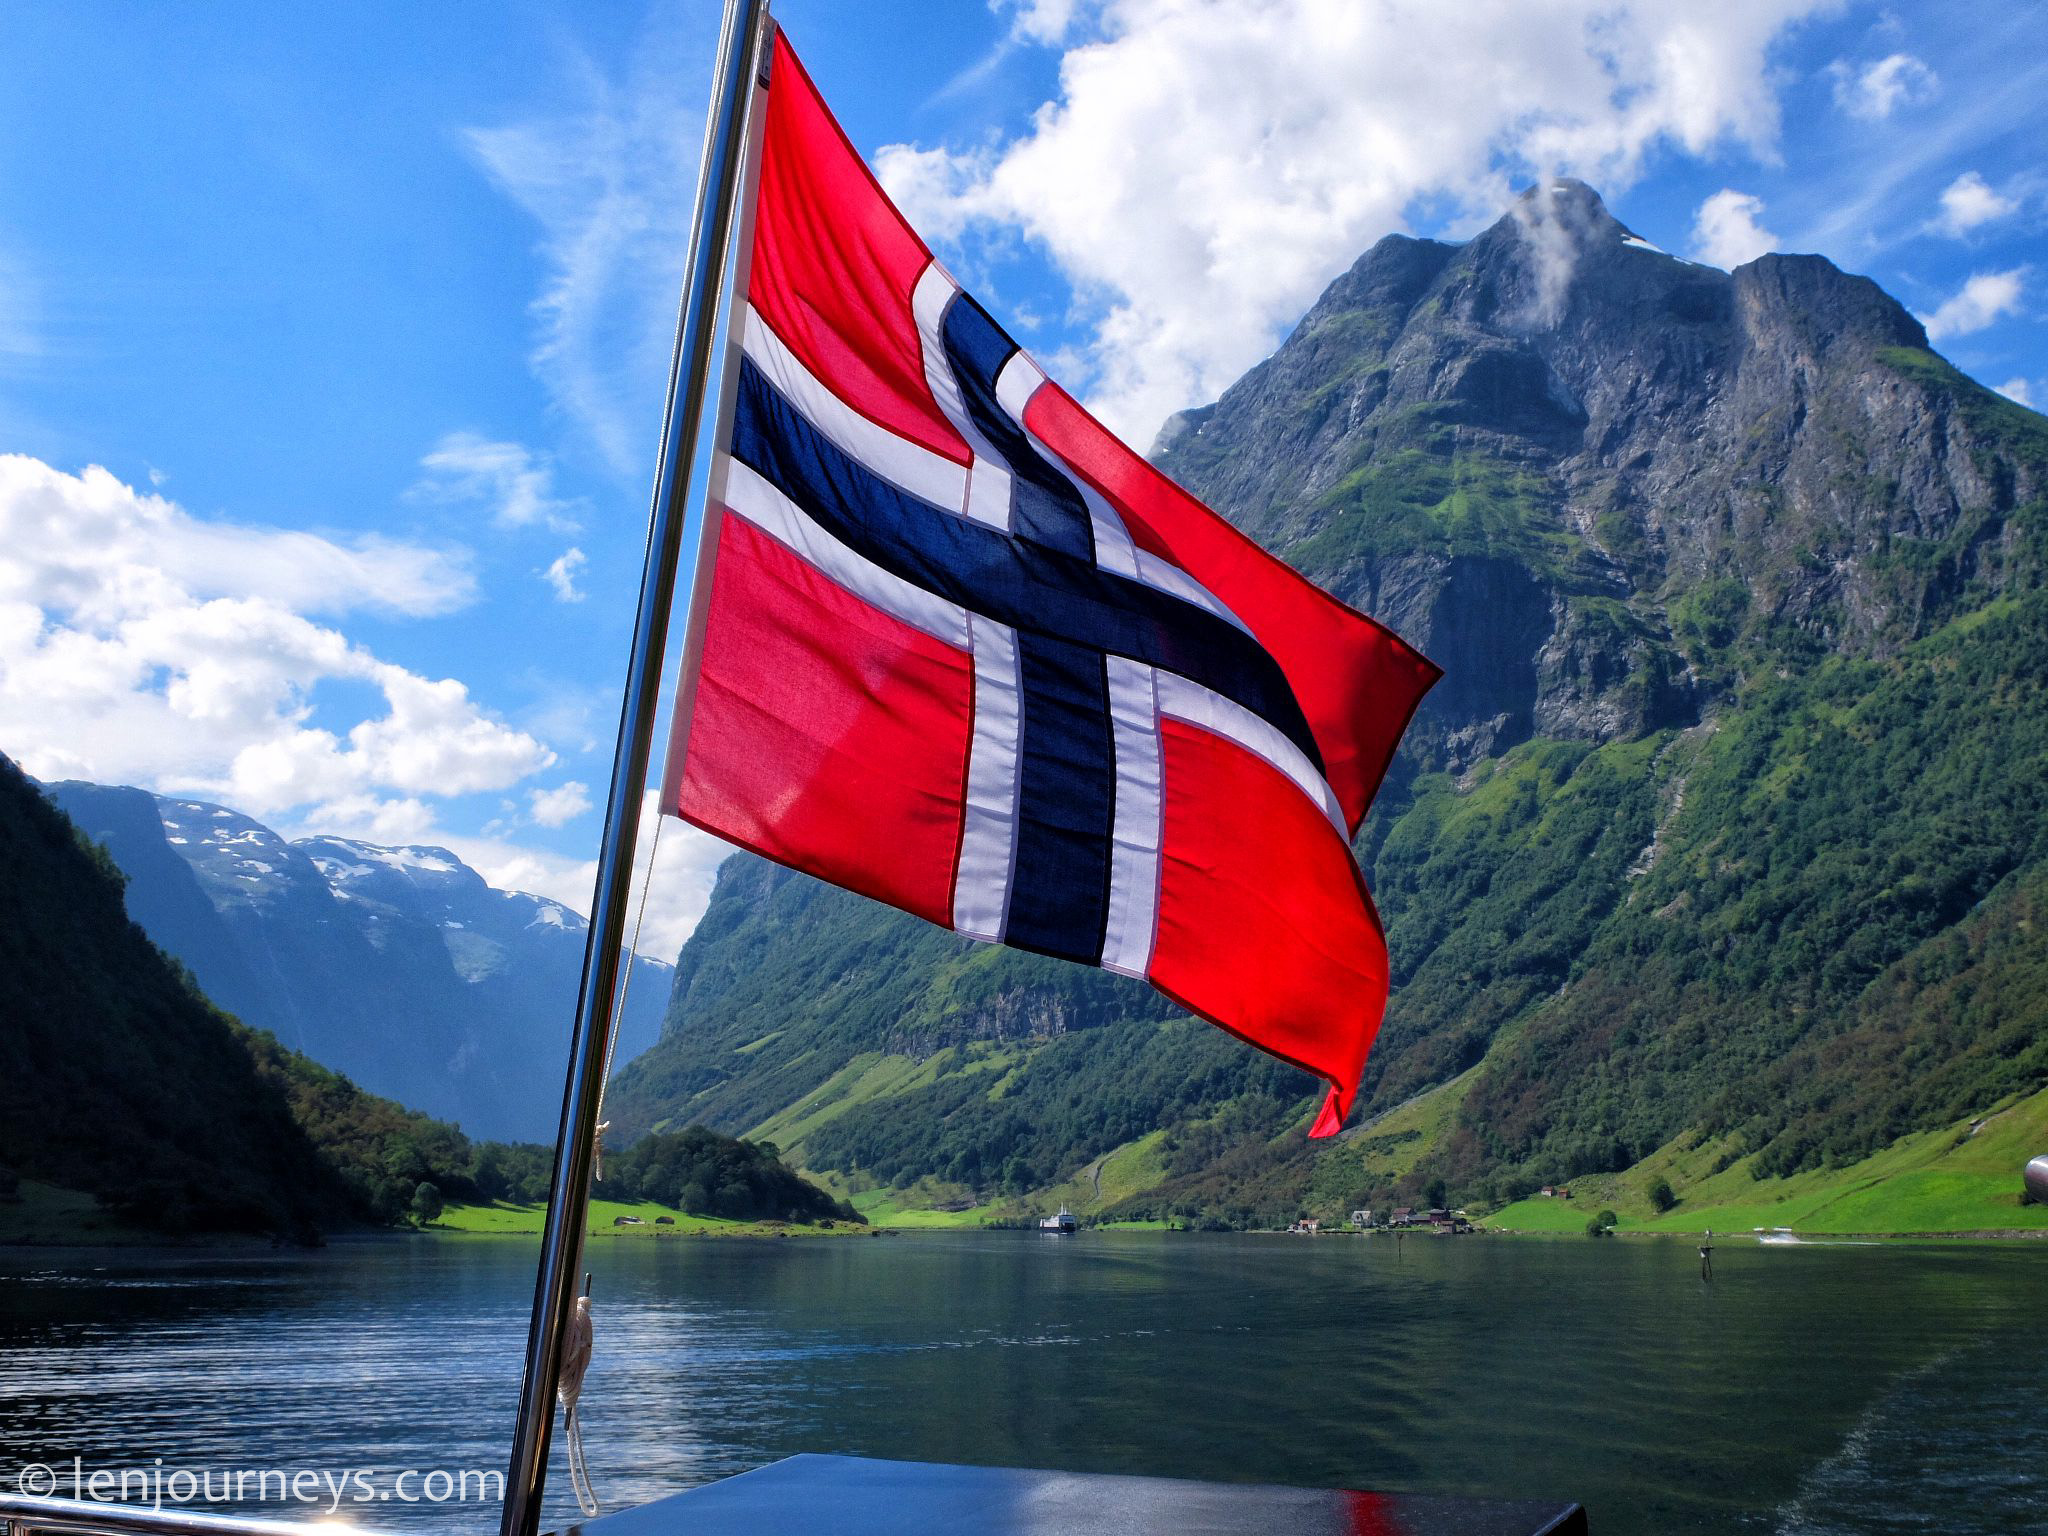 Norway's flag in Nærøyfjord